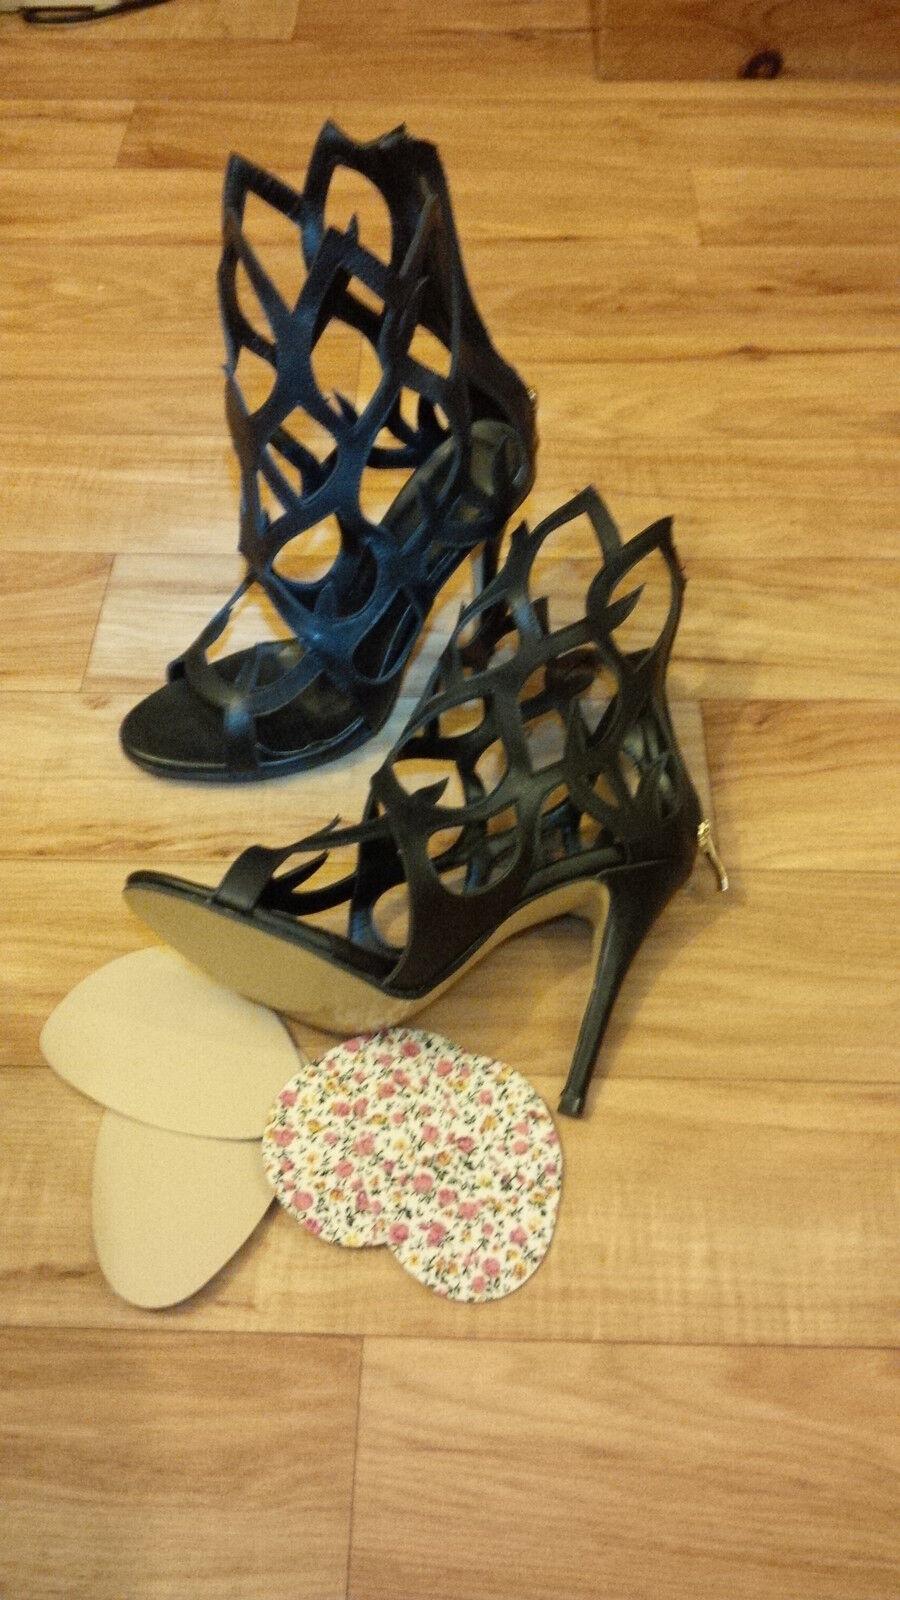 Black Black Black Choppy Cutout Ankle Boot Stilleto shoes 4.75 inch heels -  UK 5 BNIB c23544